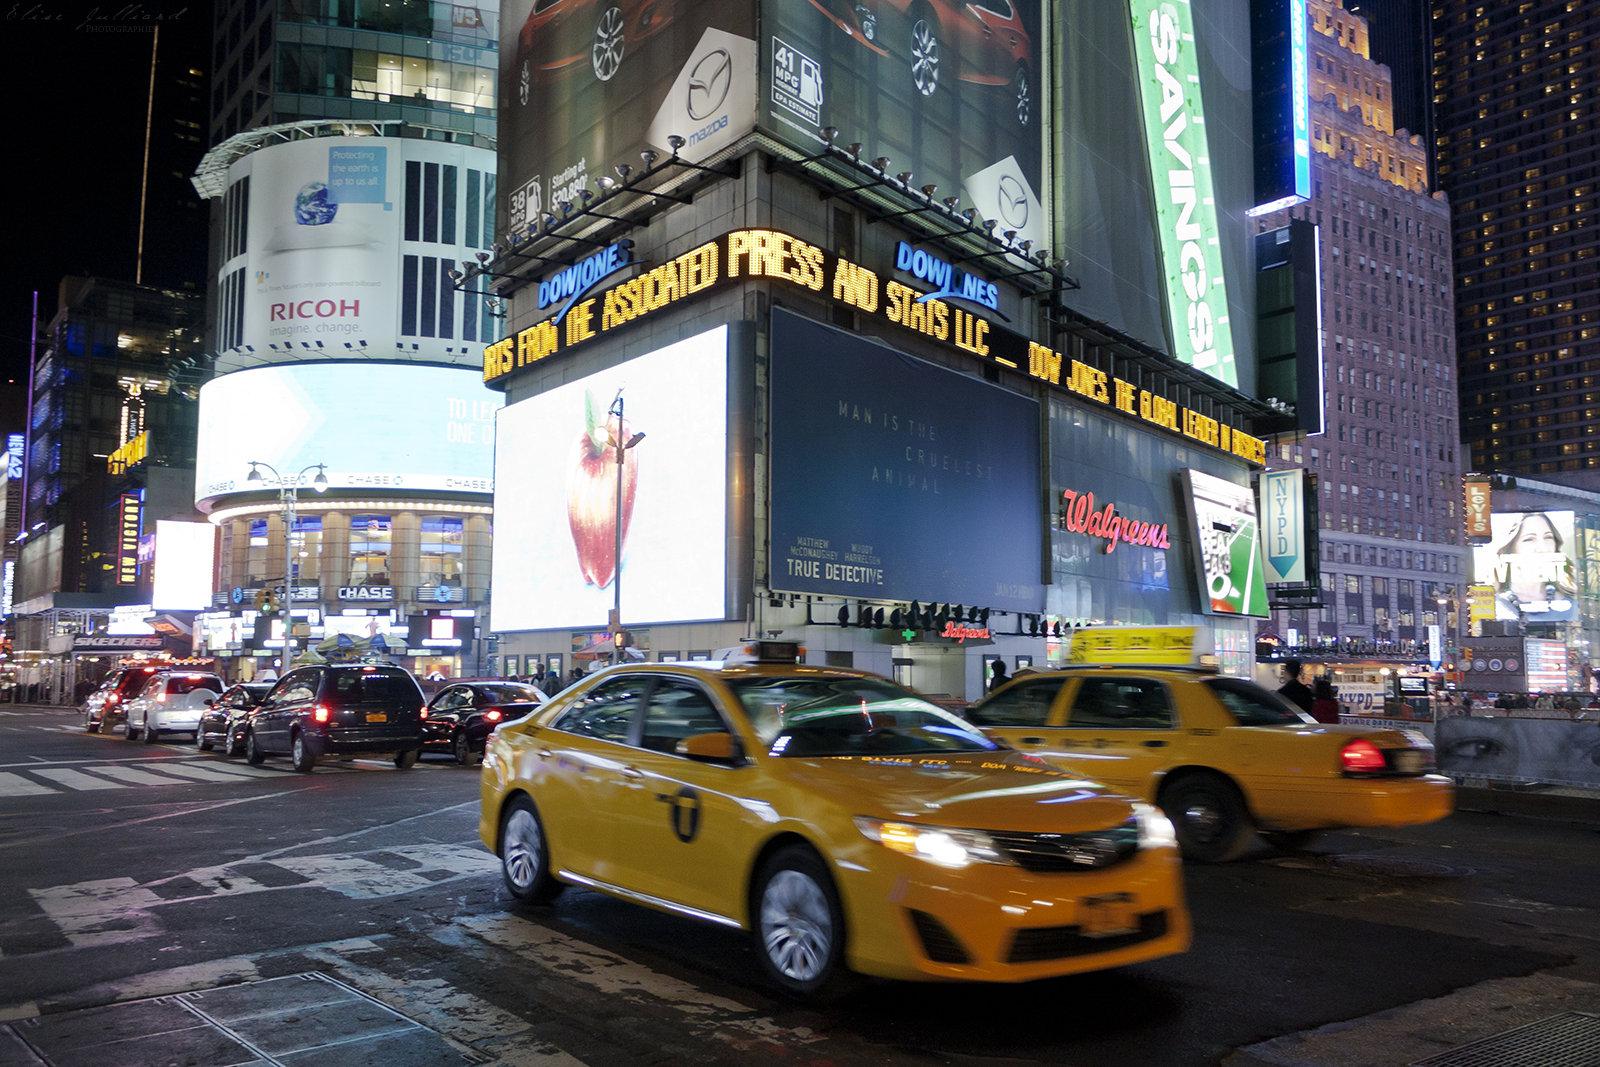 elise-julliard-photographe-etats-unis-new-york-time-square-nuit-manhattan-taxis